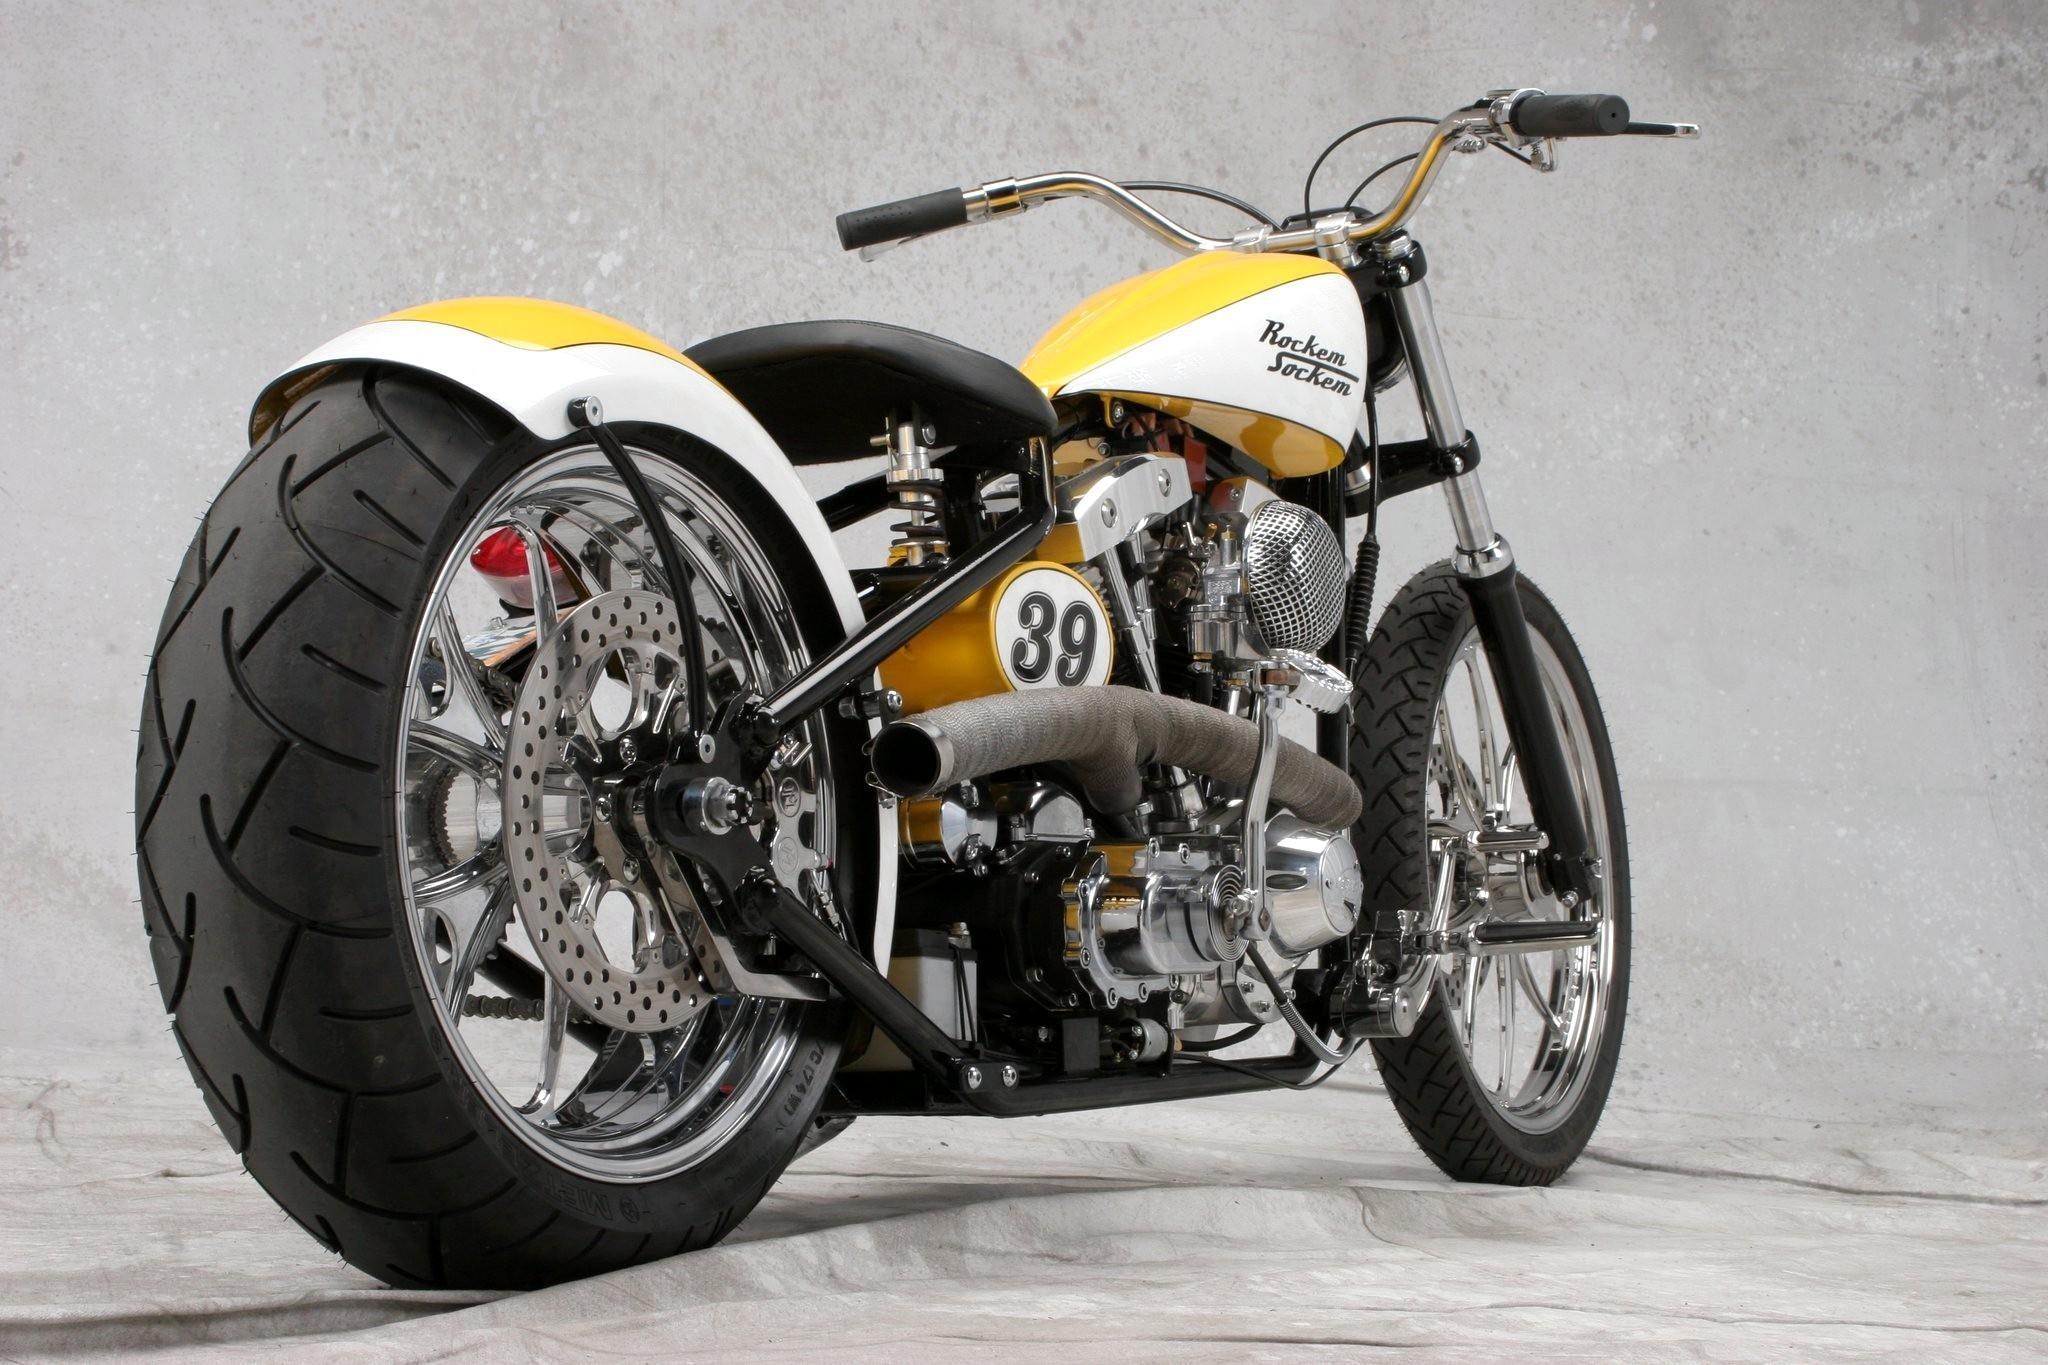 Res: 2048x1365, Bobber Motorcycle wallpapers for desktop